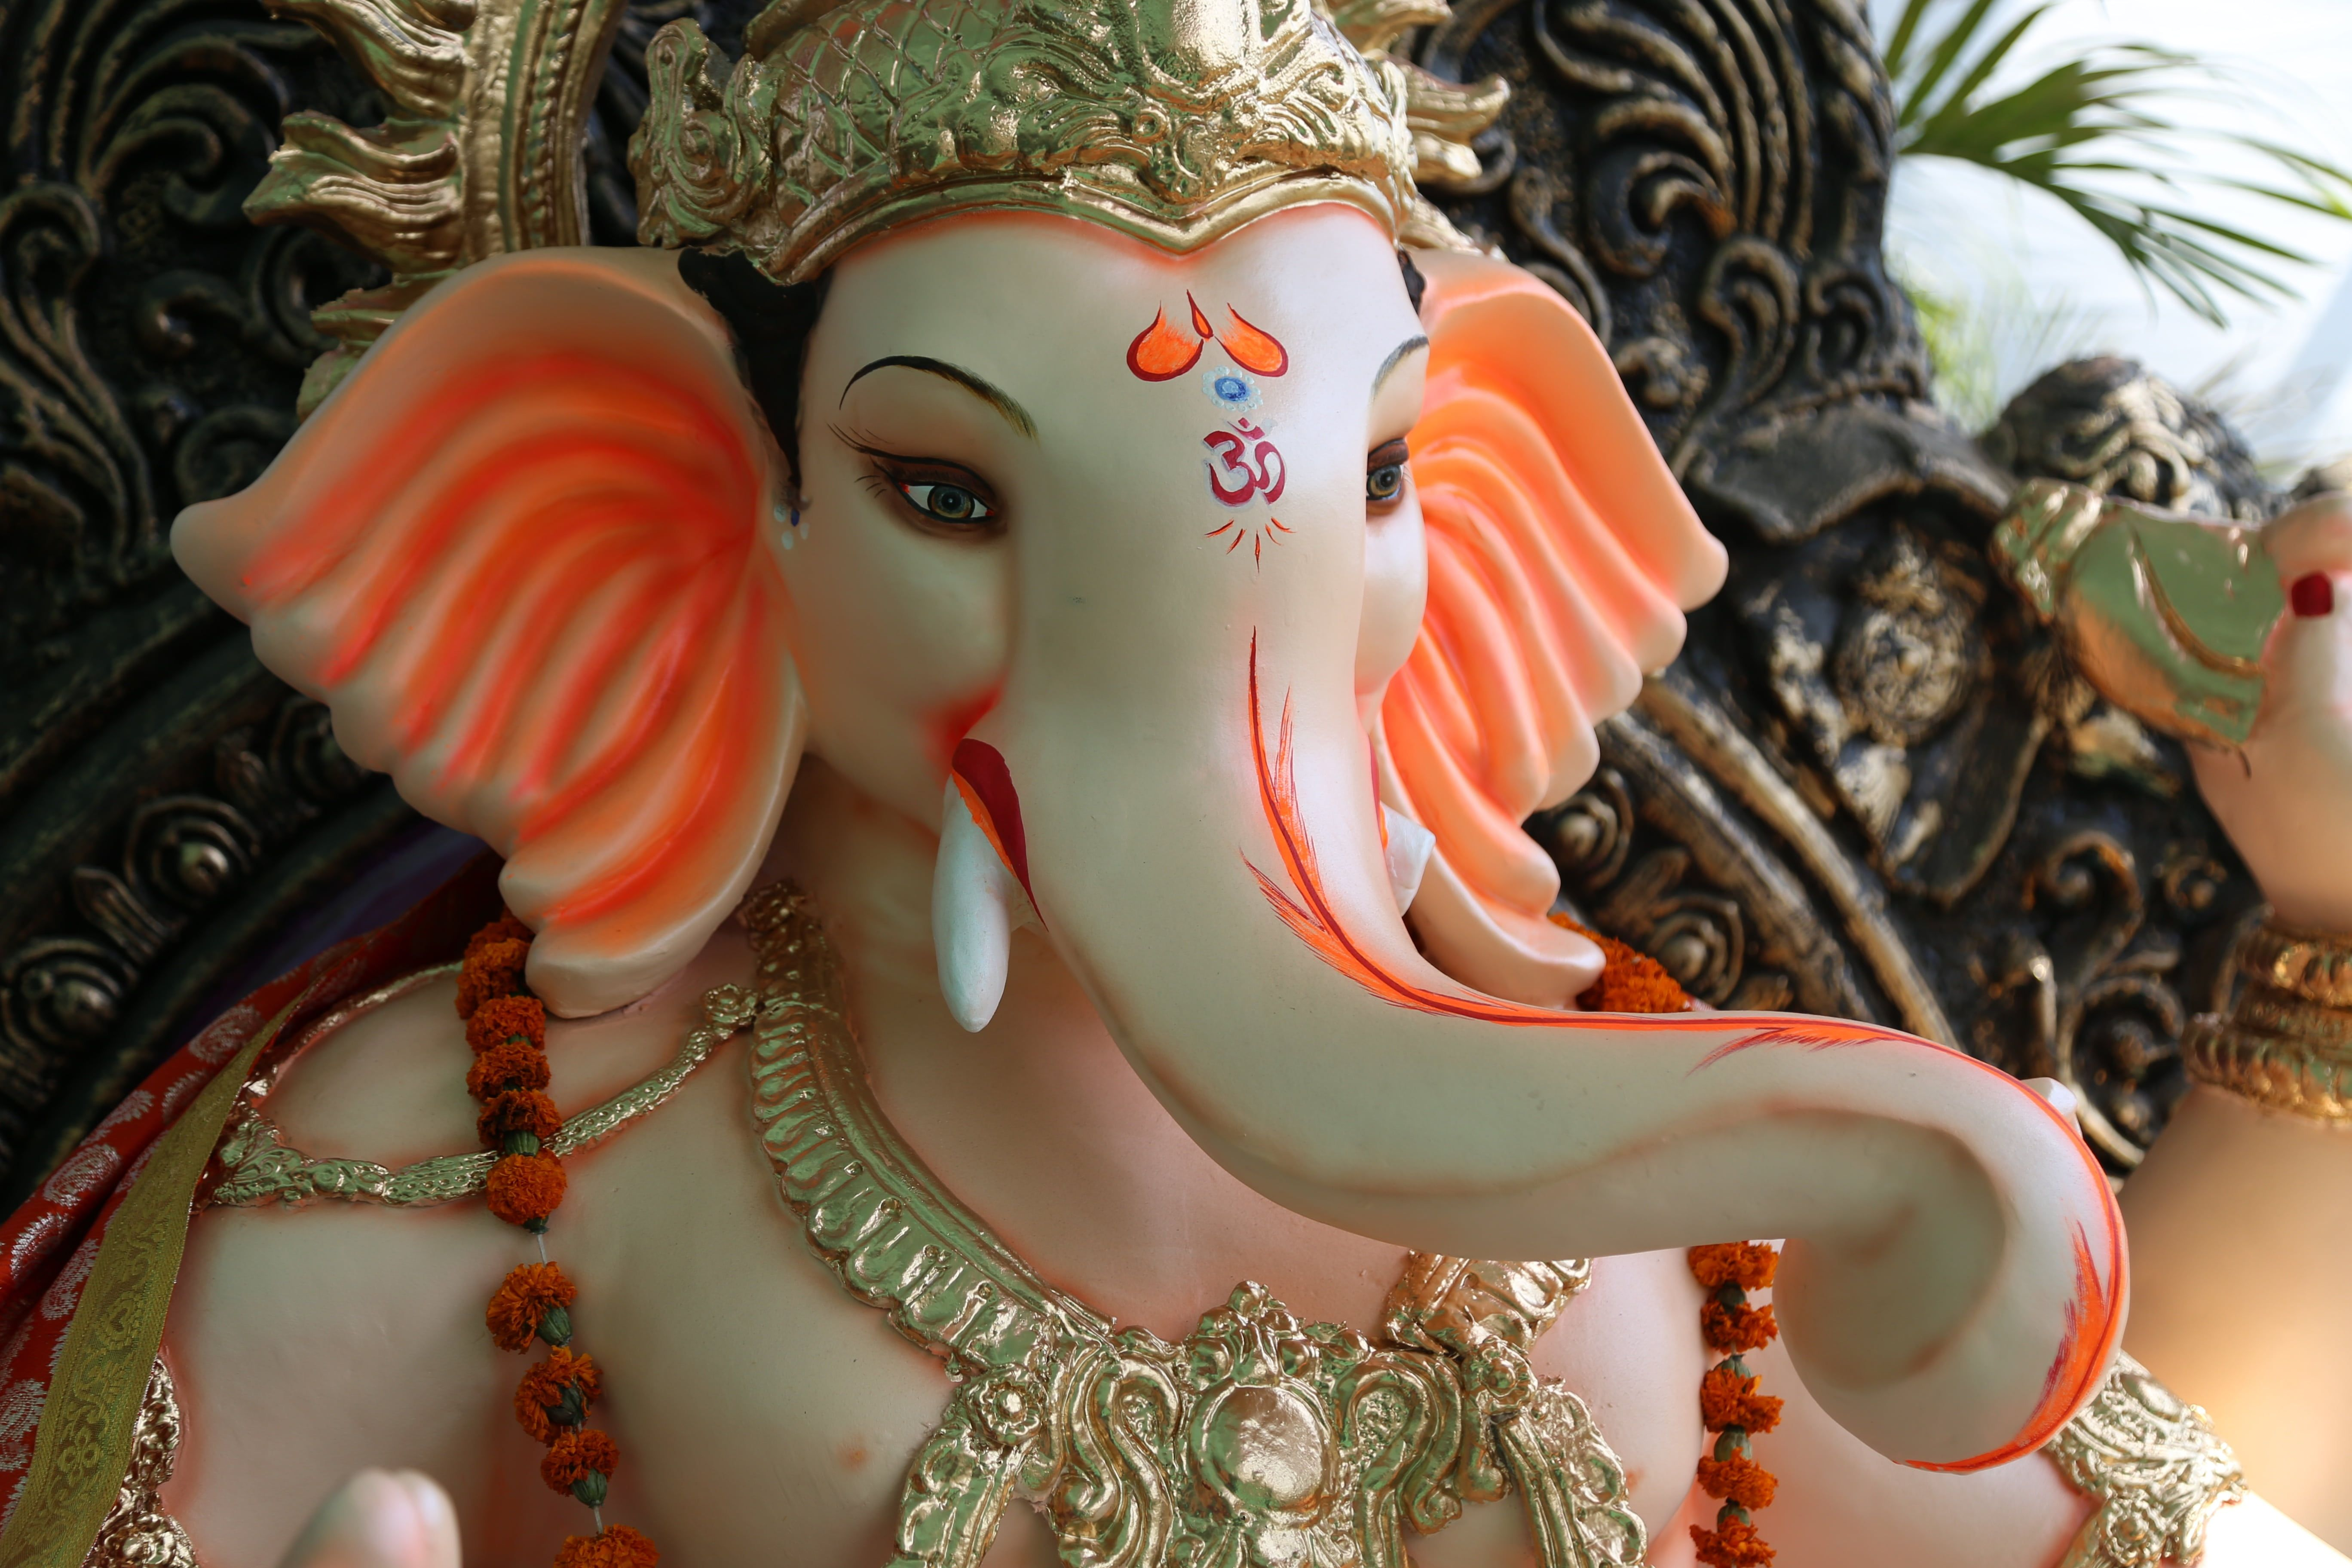 Lord Ganesha Statue Ganapati Ganesh Hindu Deity God Sculpture Dragon Animal Re Chaturthi Image Happy Images Essay On